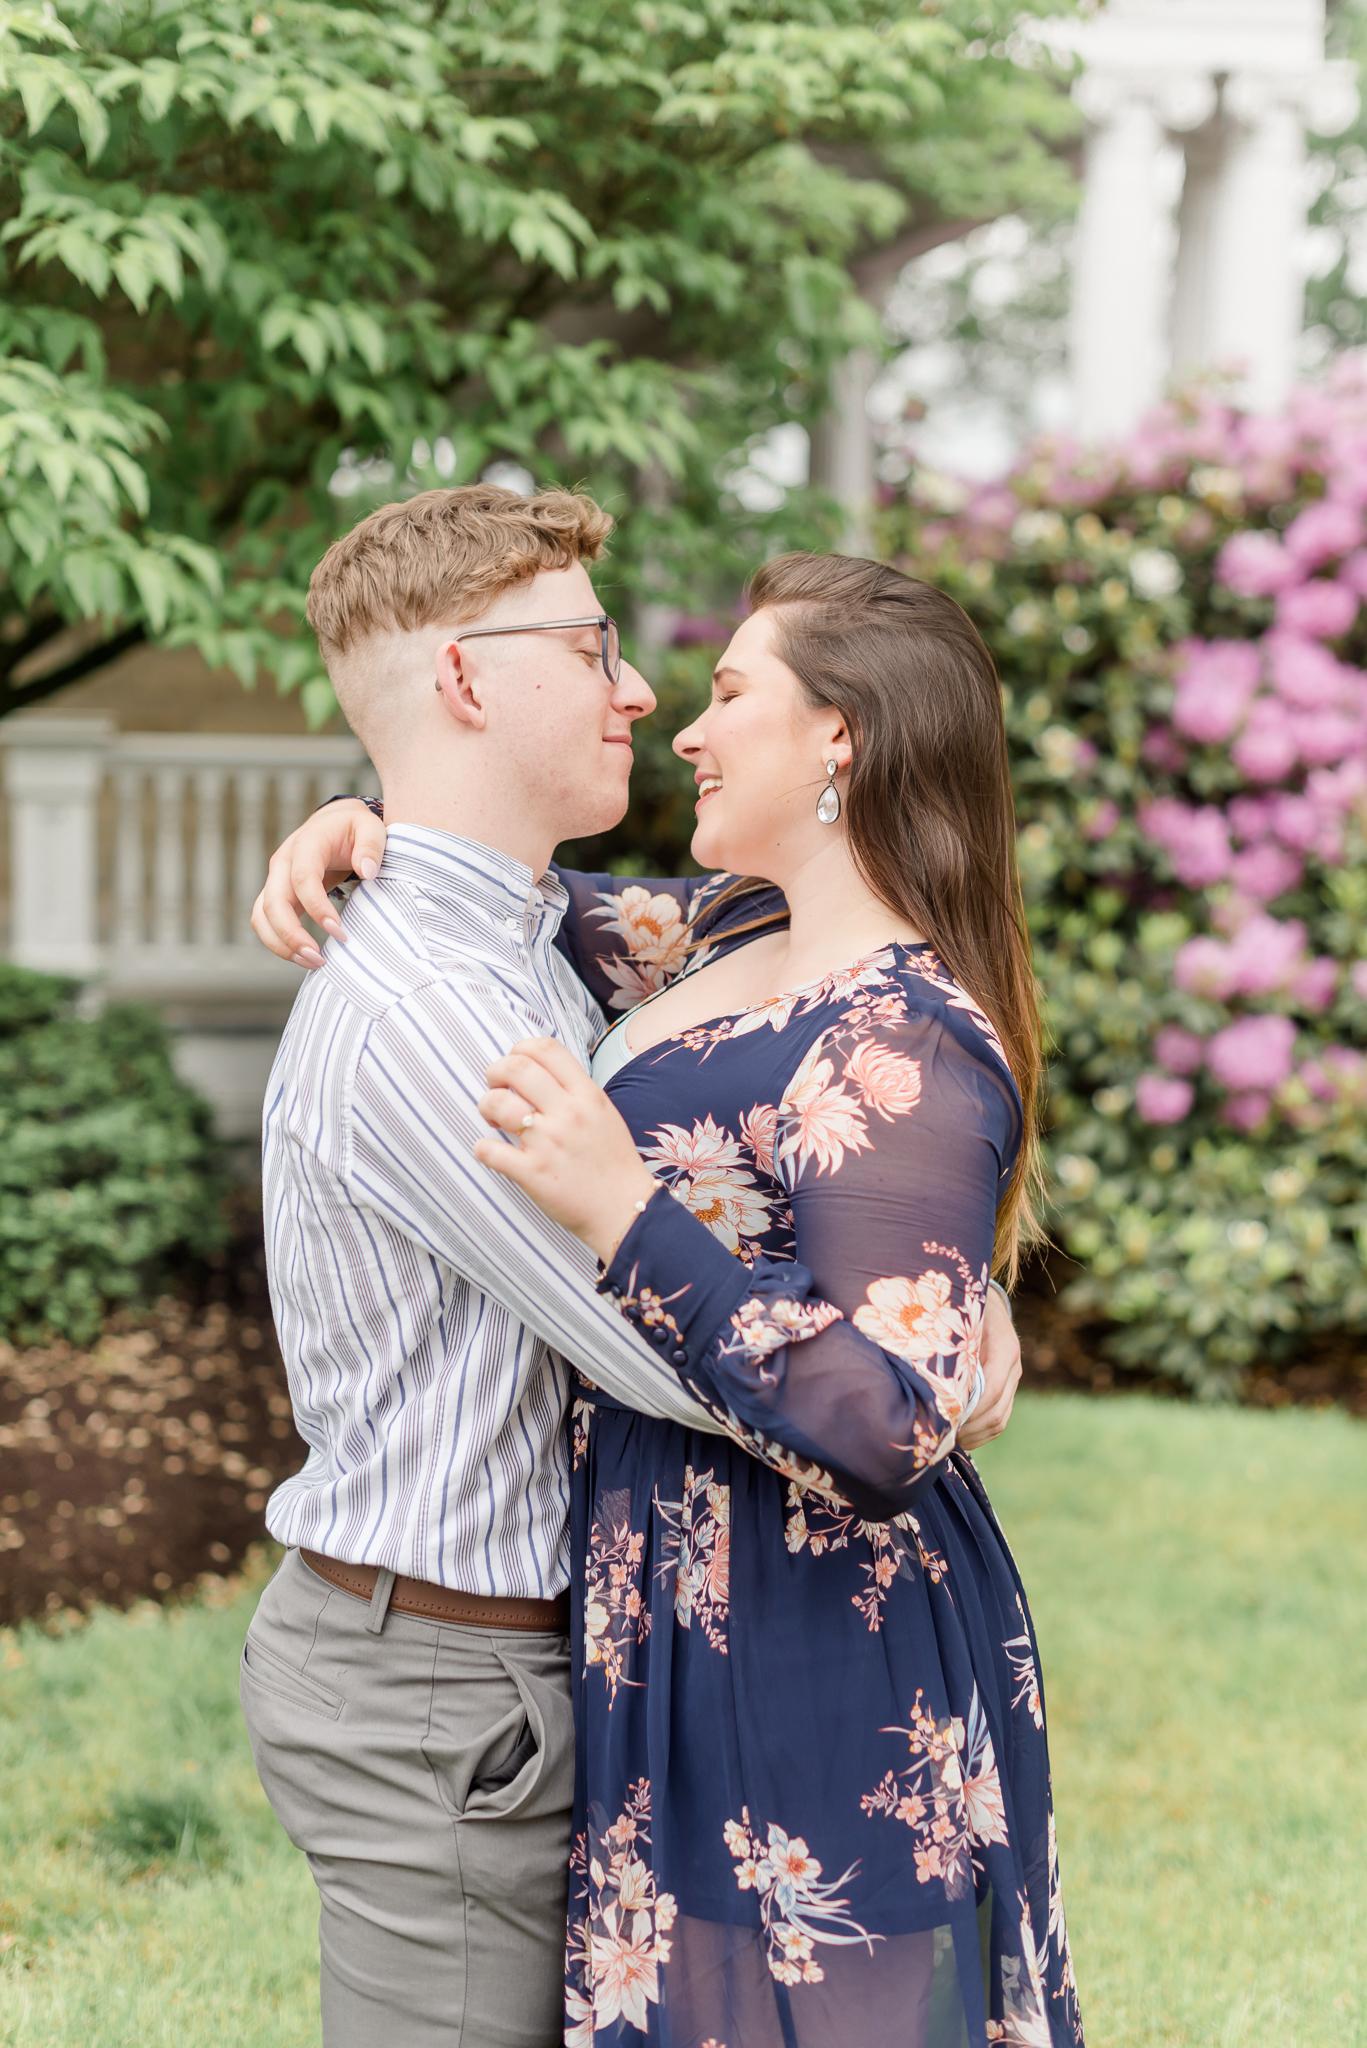 West Virginia University Surprise Proposal During Graduation Ceremony-2.jpg